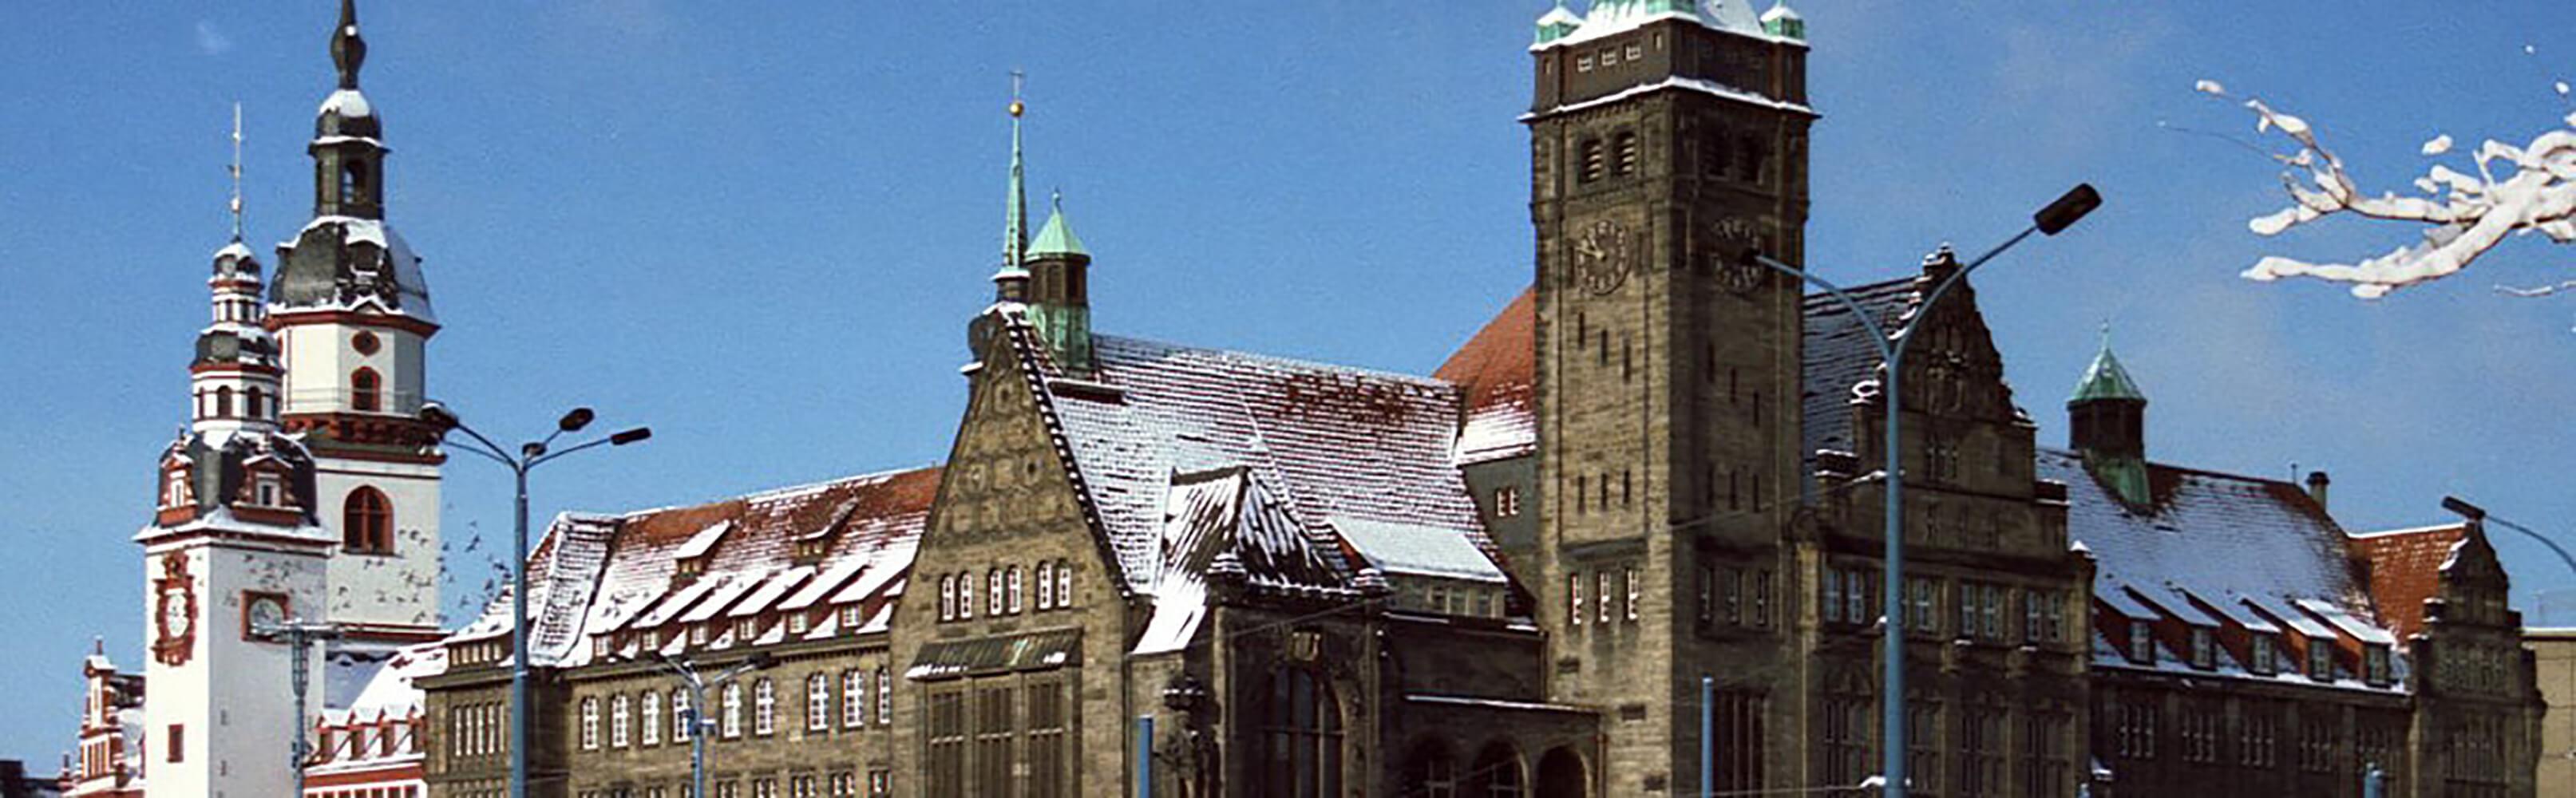 Altes Rathaus 1